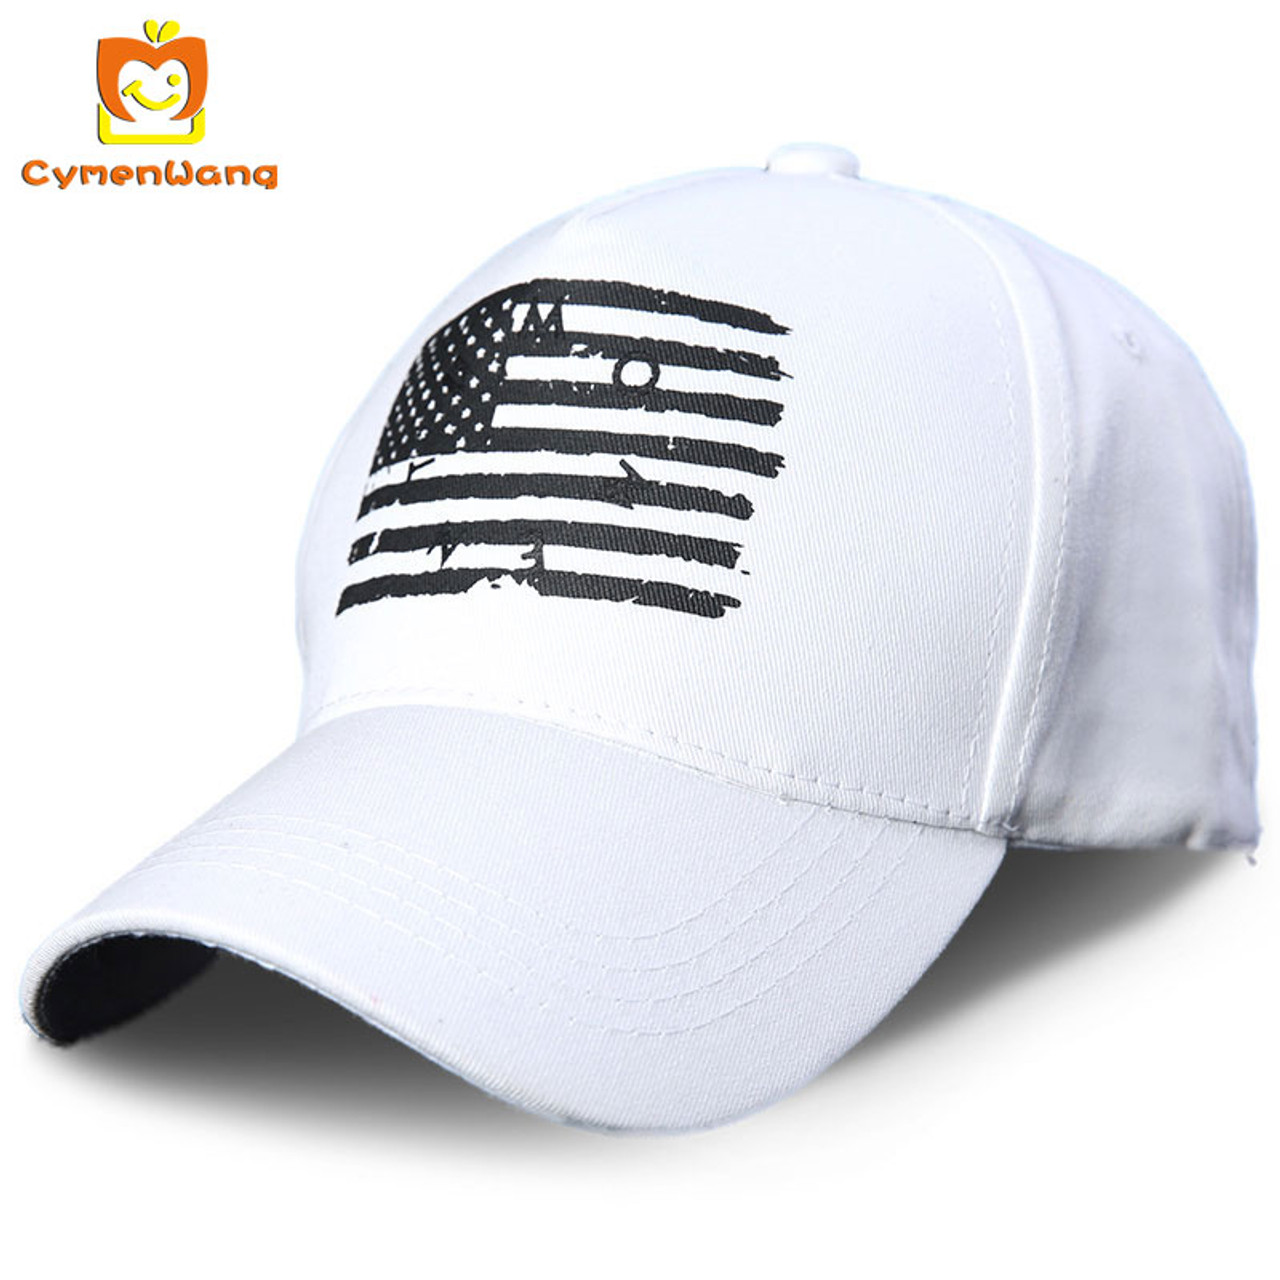 1b715e9dc837f6 Cymenwang wholesale brand spring cotton baseball cap snapback hat summer hip  hop fitted hats gorras 5 ...